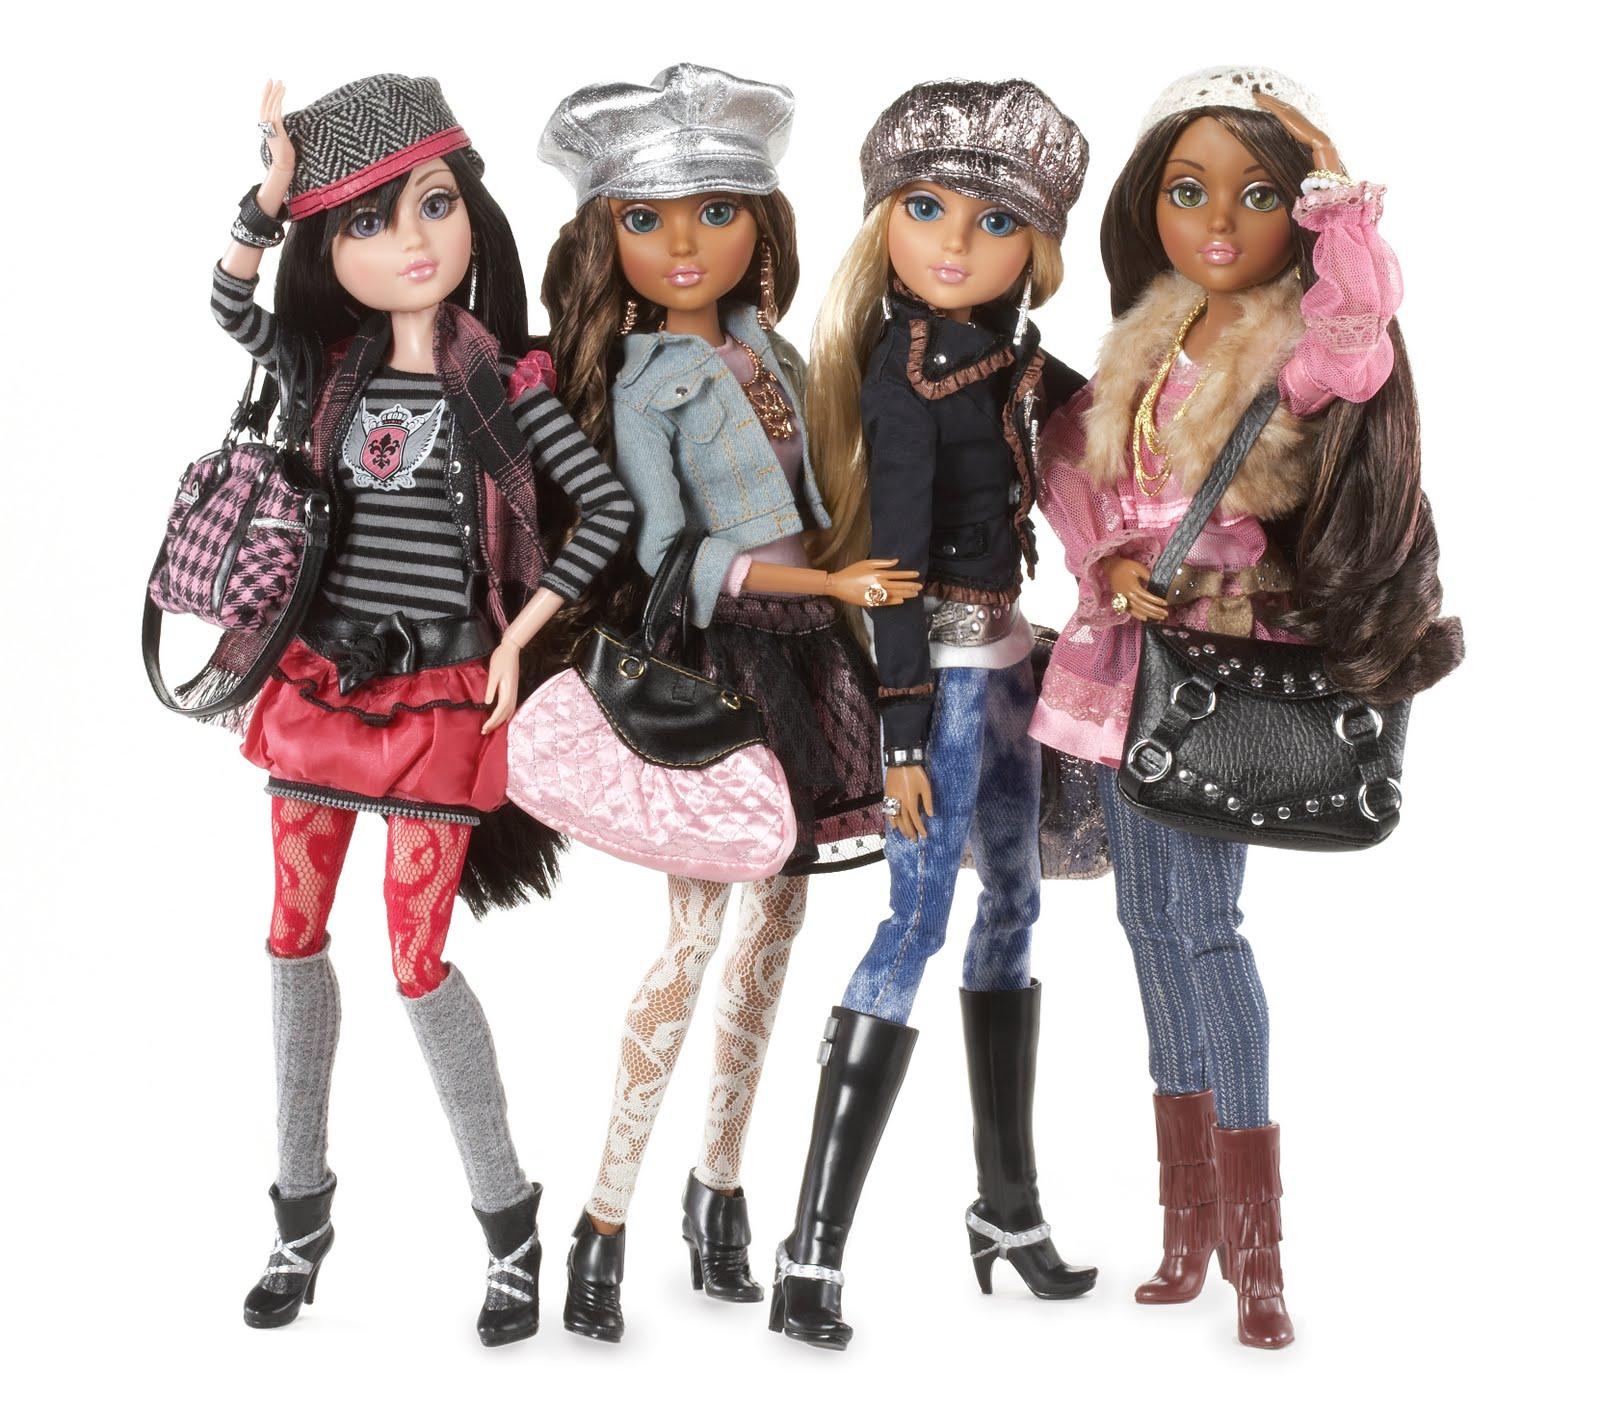 Moxie Teen Dolls